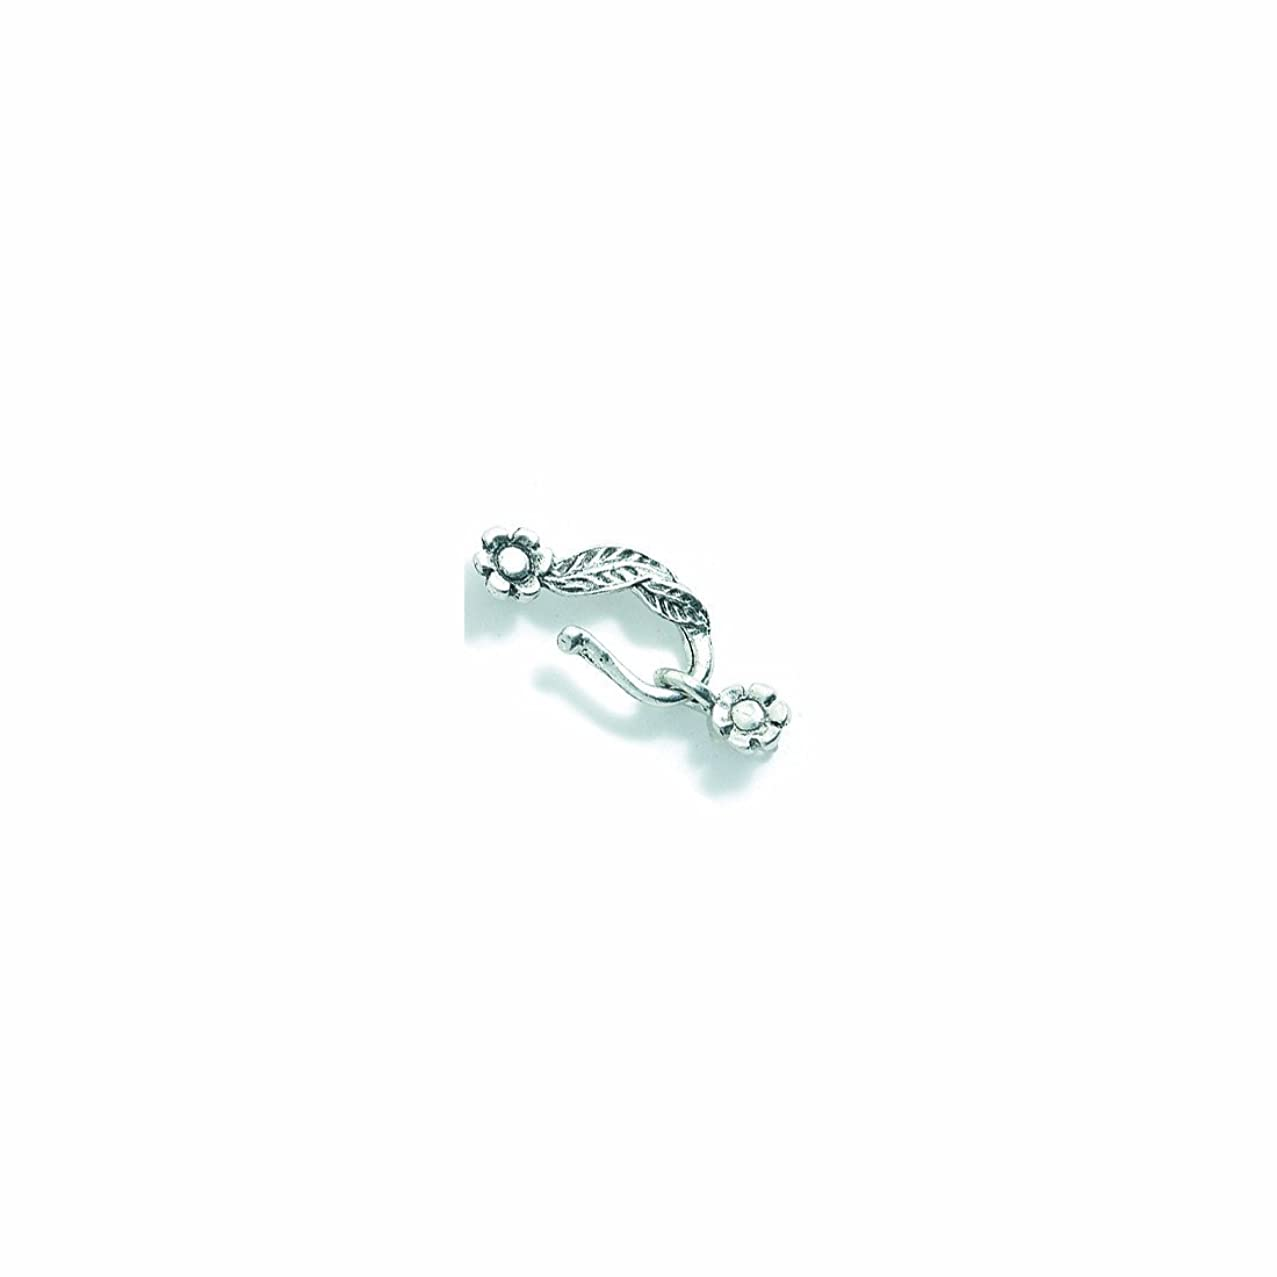 Shipwreck Beads Pewter Hook Flower Clasp, Metallic, Silver, 32mm, Set of 4